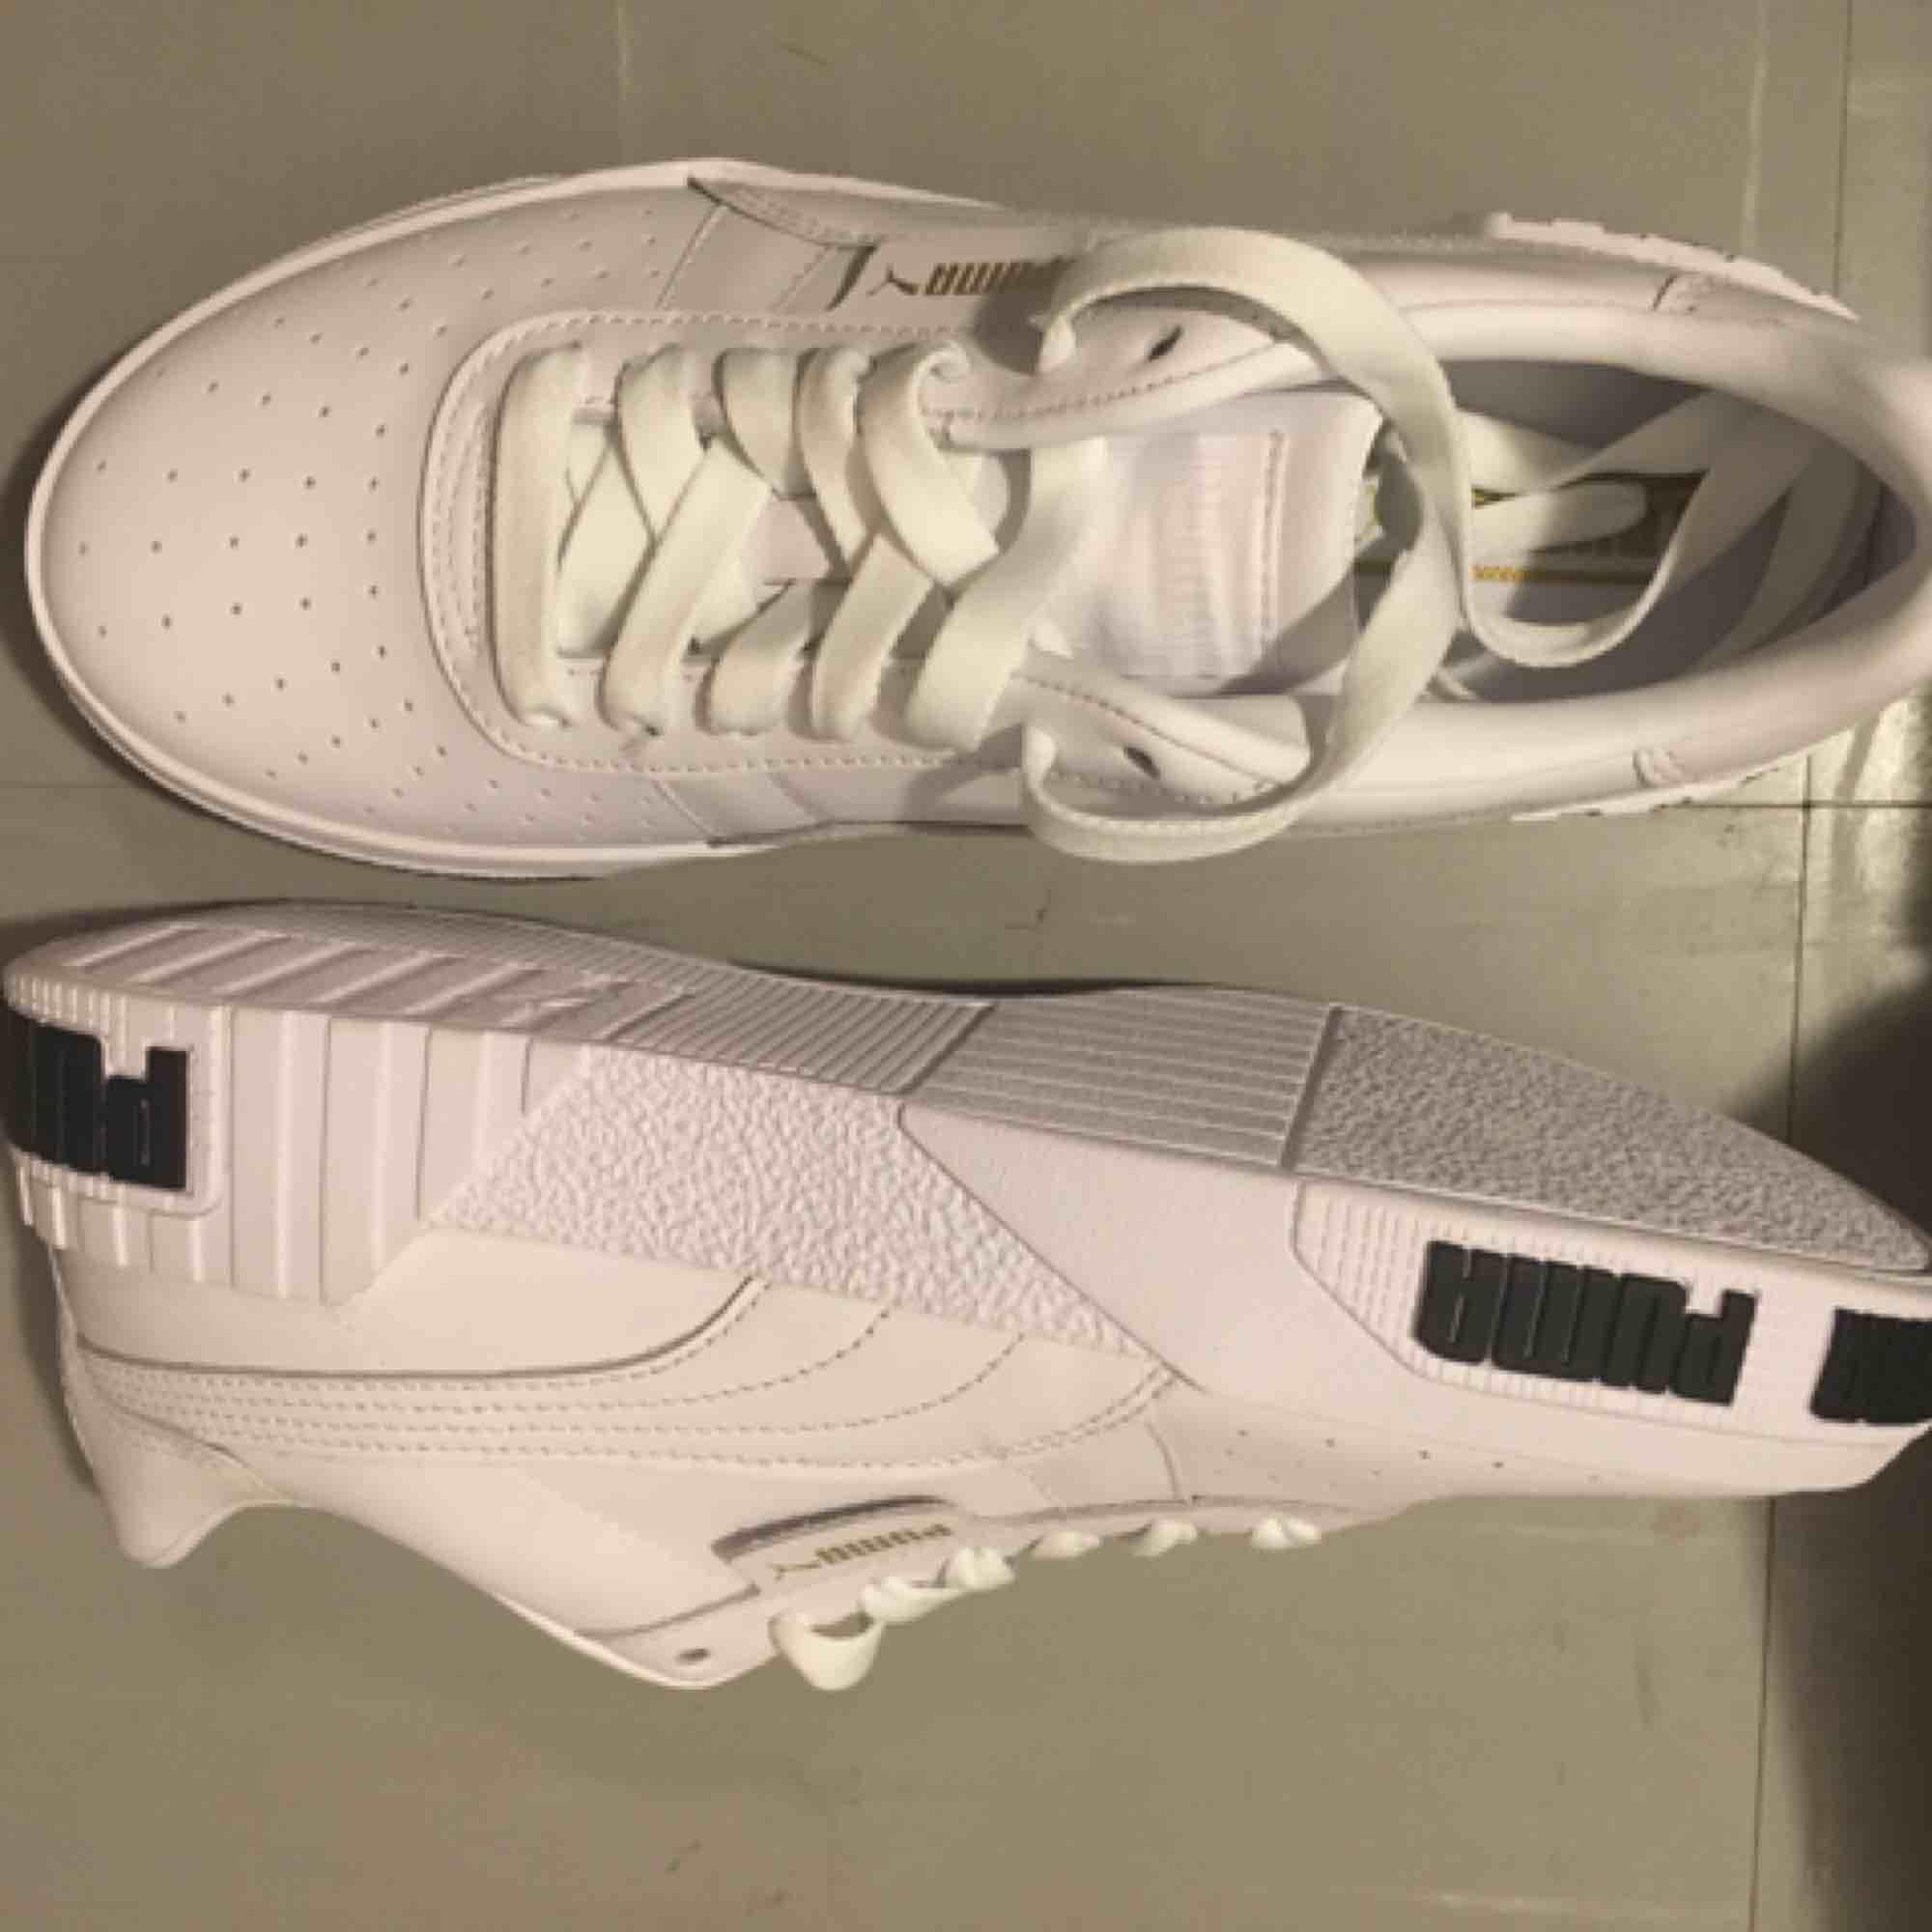 Puma Sneaker White Metallic Gold Size 38.5 new condition . Skor.